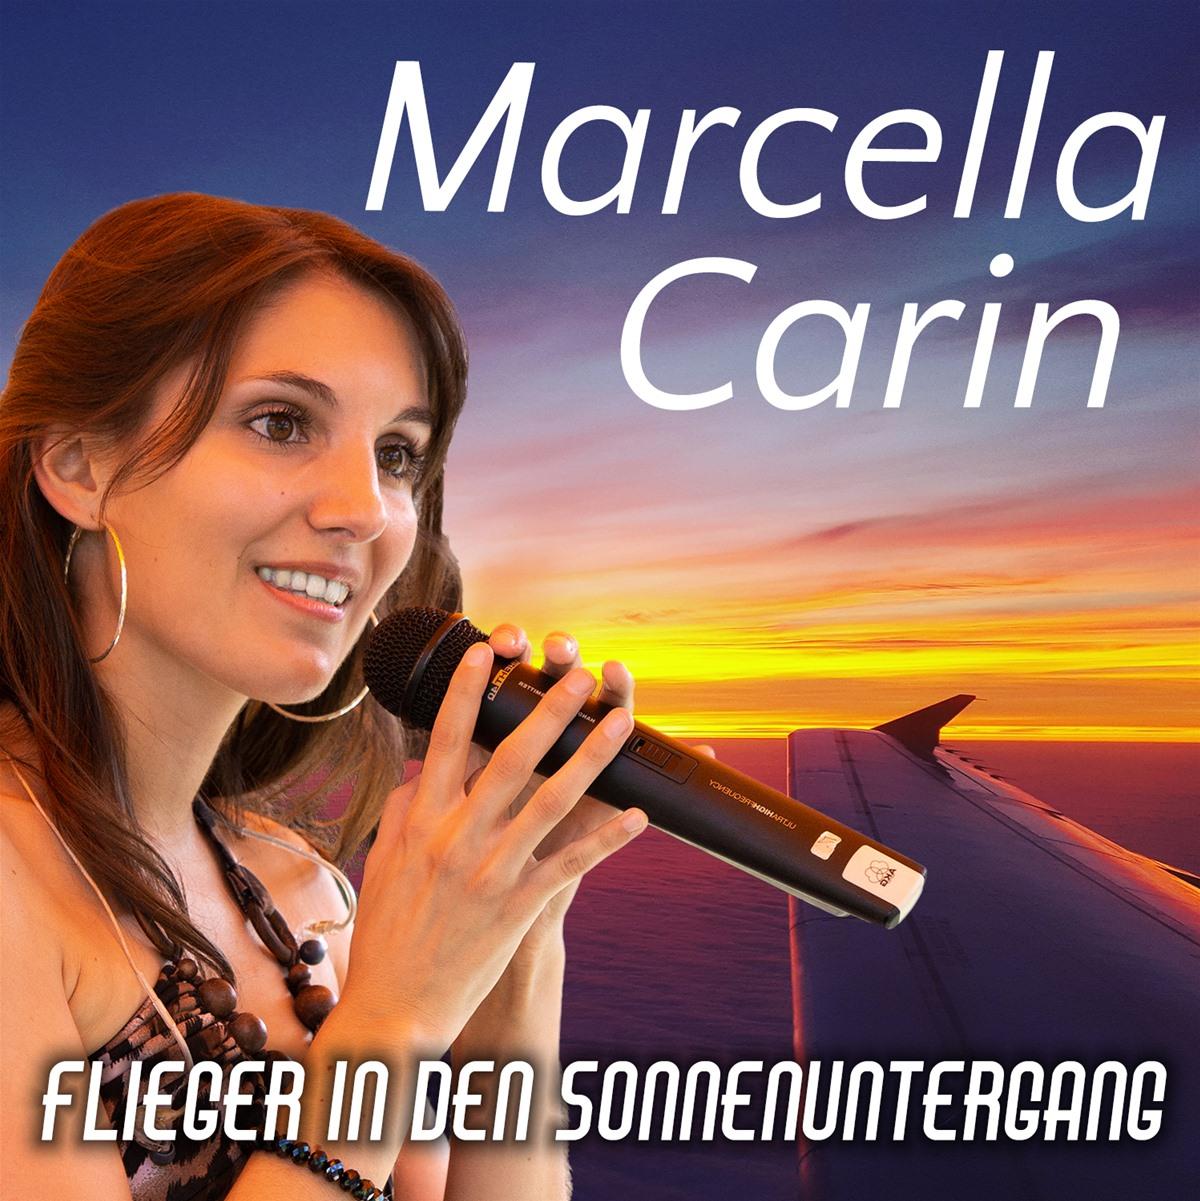 MARCELLA CARIN * Flieger in den Sonnenuntergang (Download-Track)